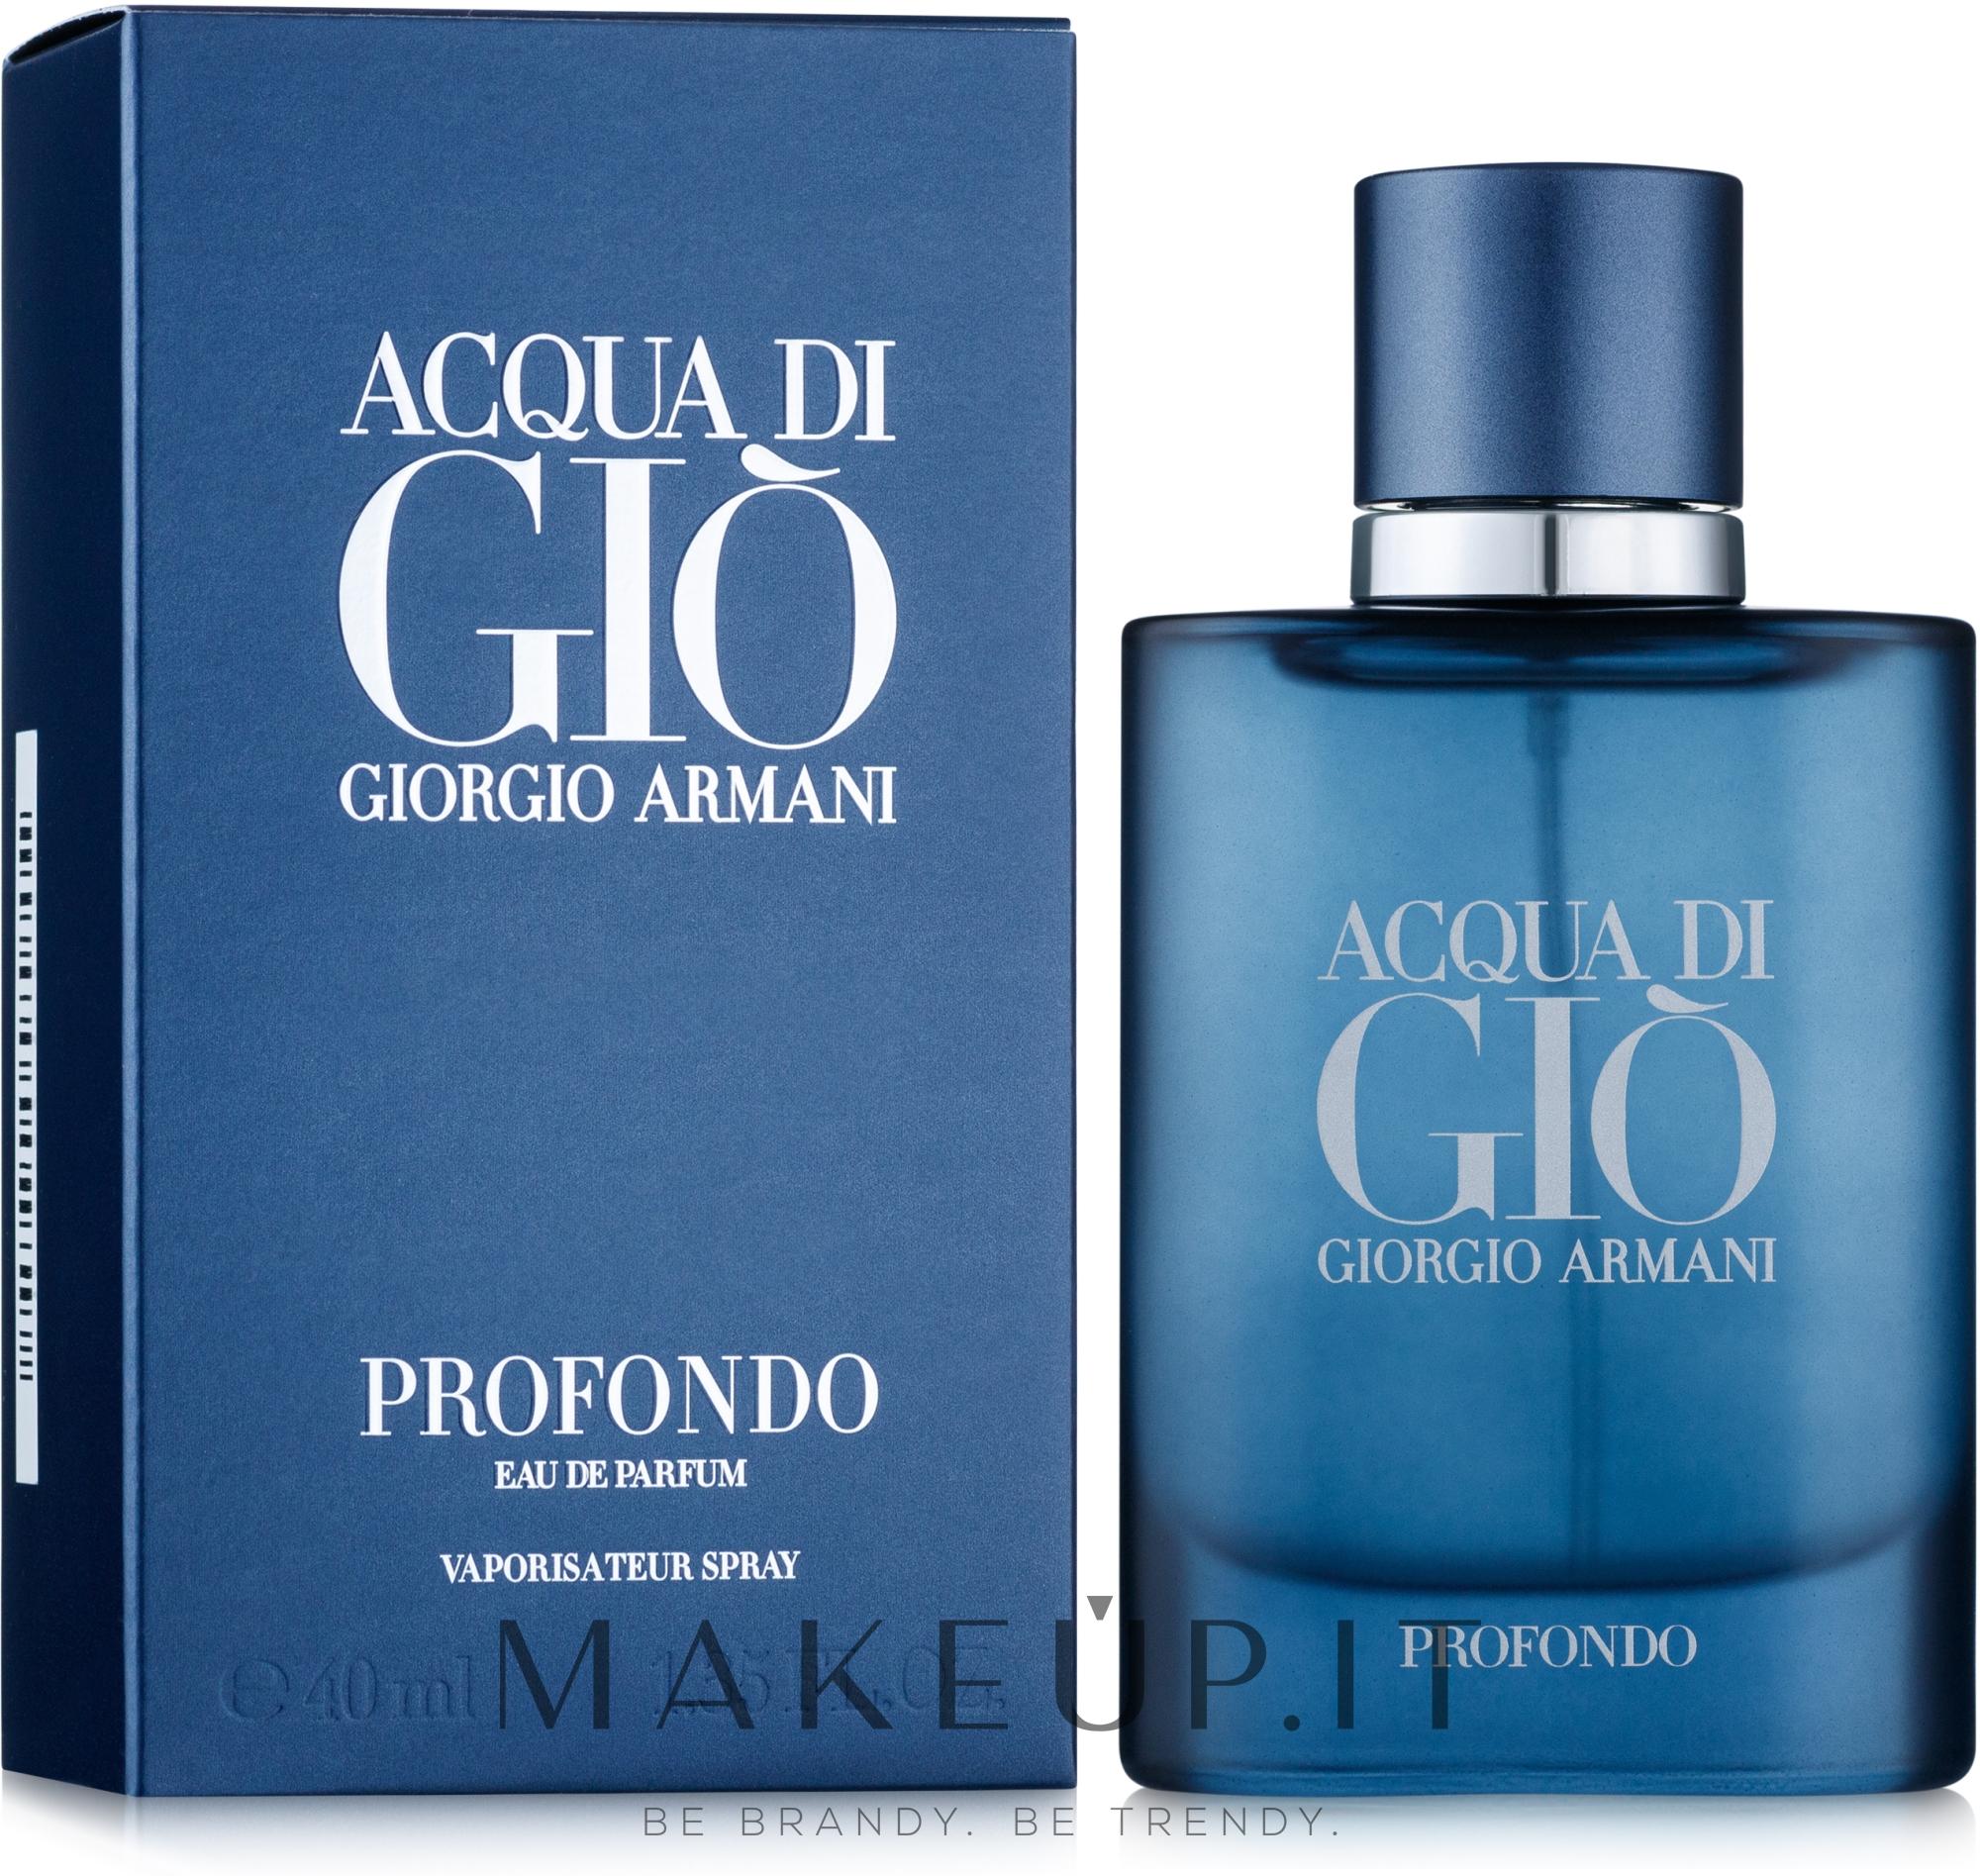 Giorgio Armani Acqua di Gio Profondo - Eau de Parfum — foto 40 ml